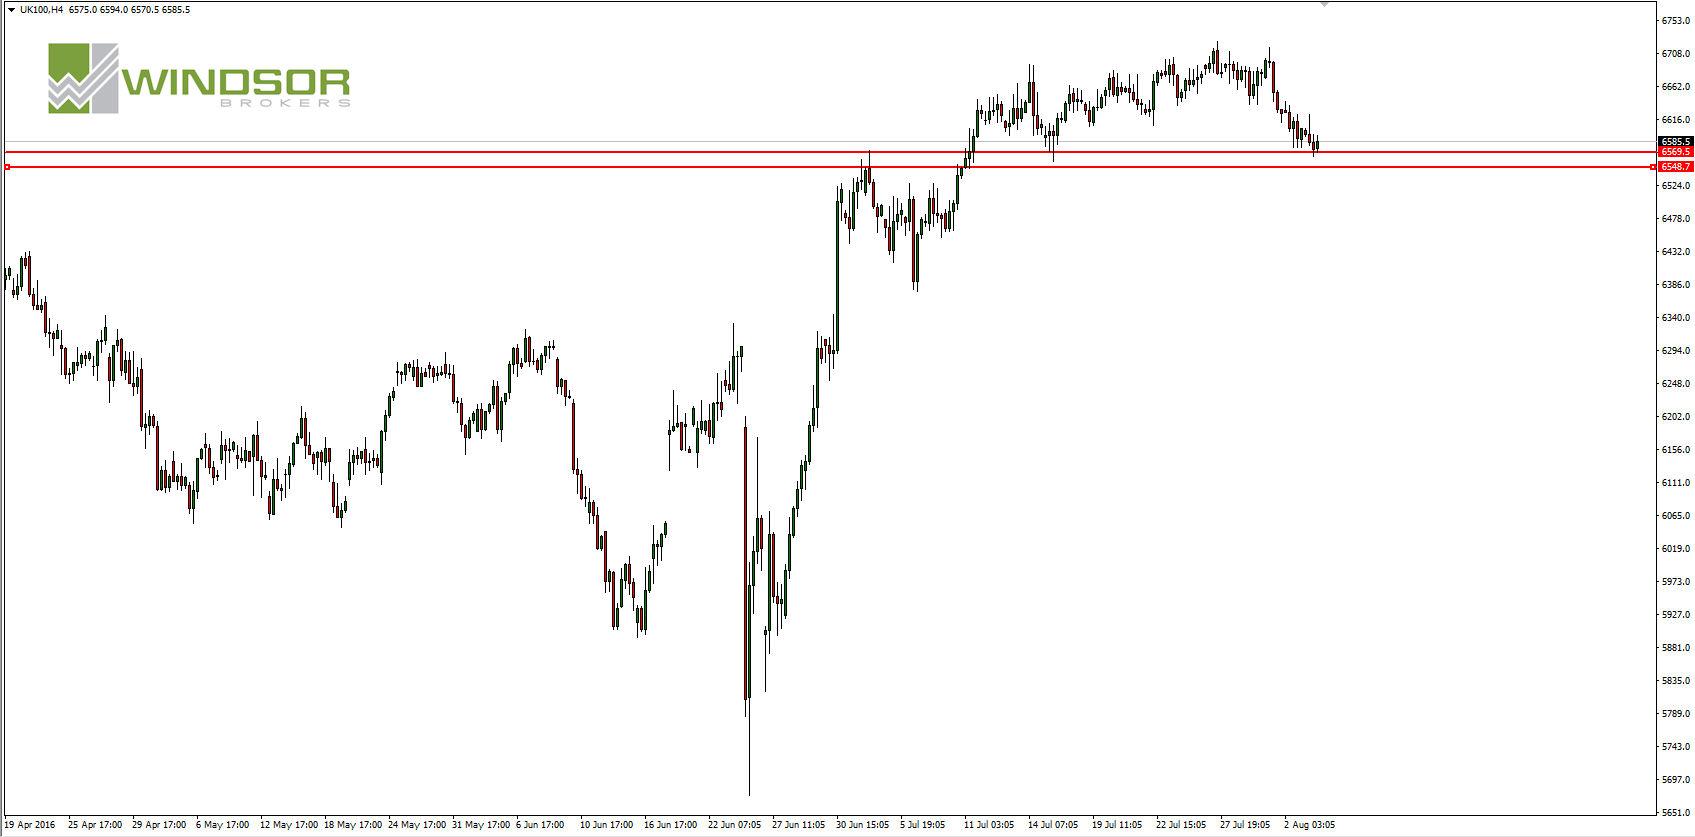 Wykres indeksu FTSE100 dla interwału H4.